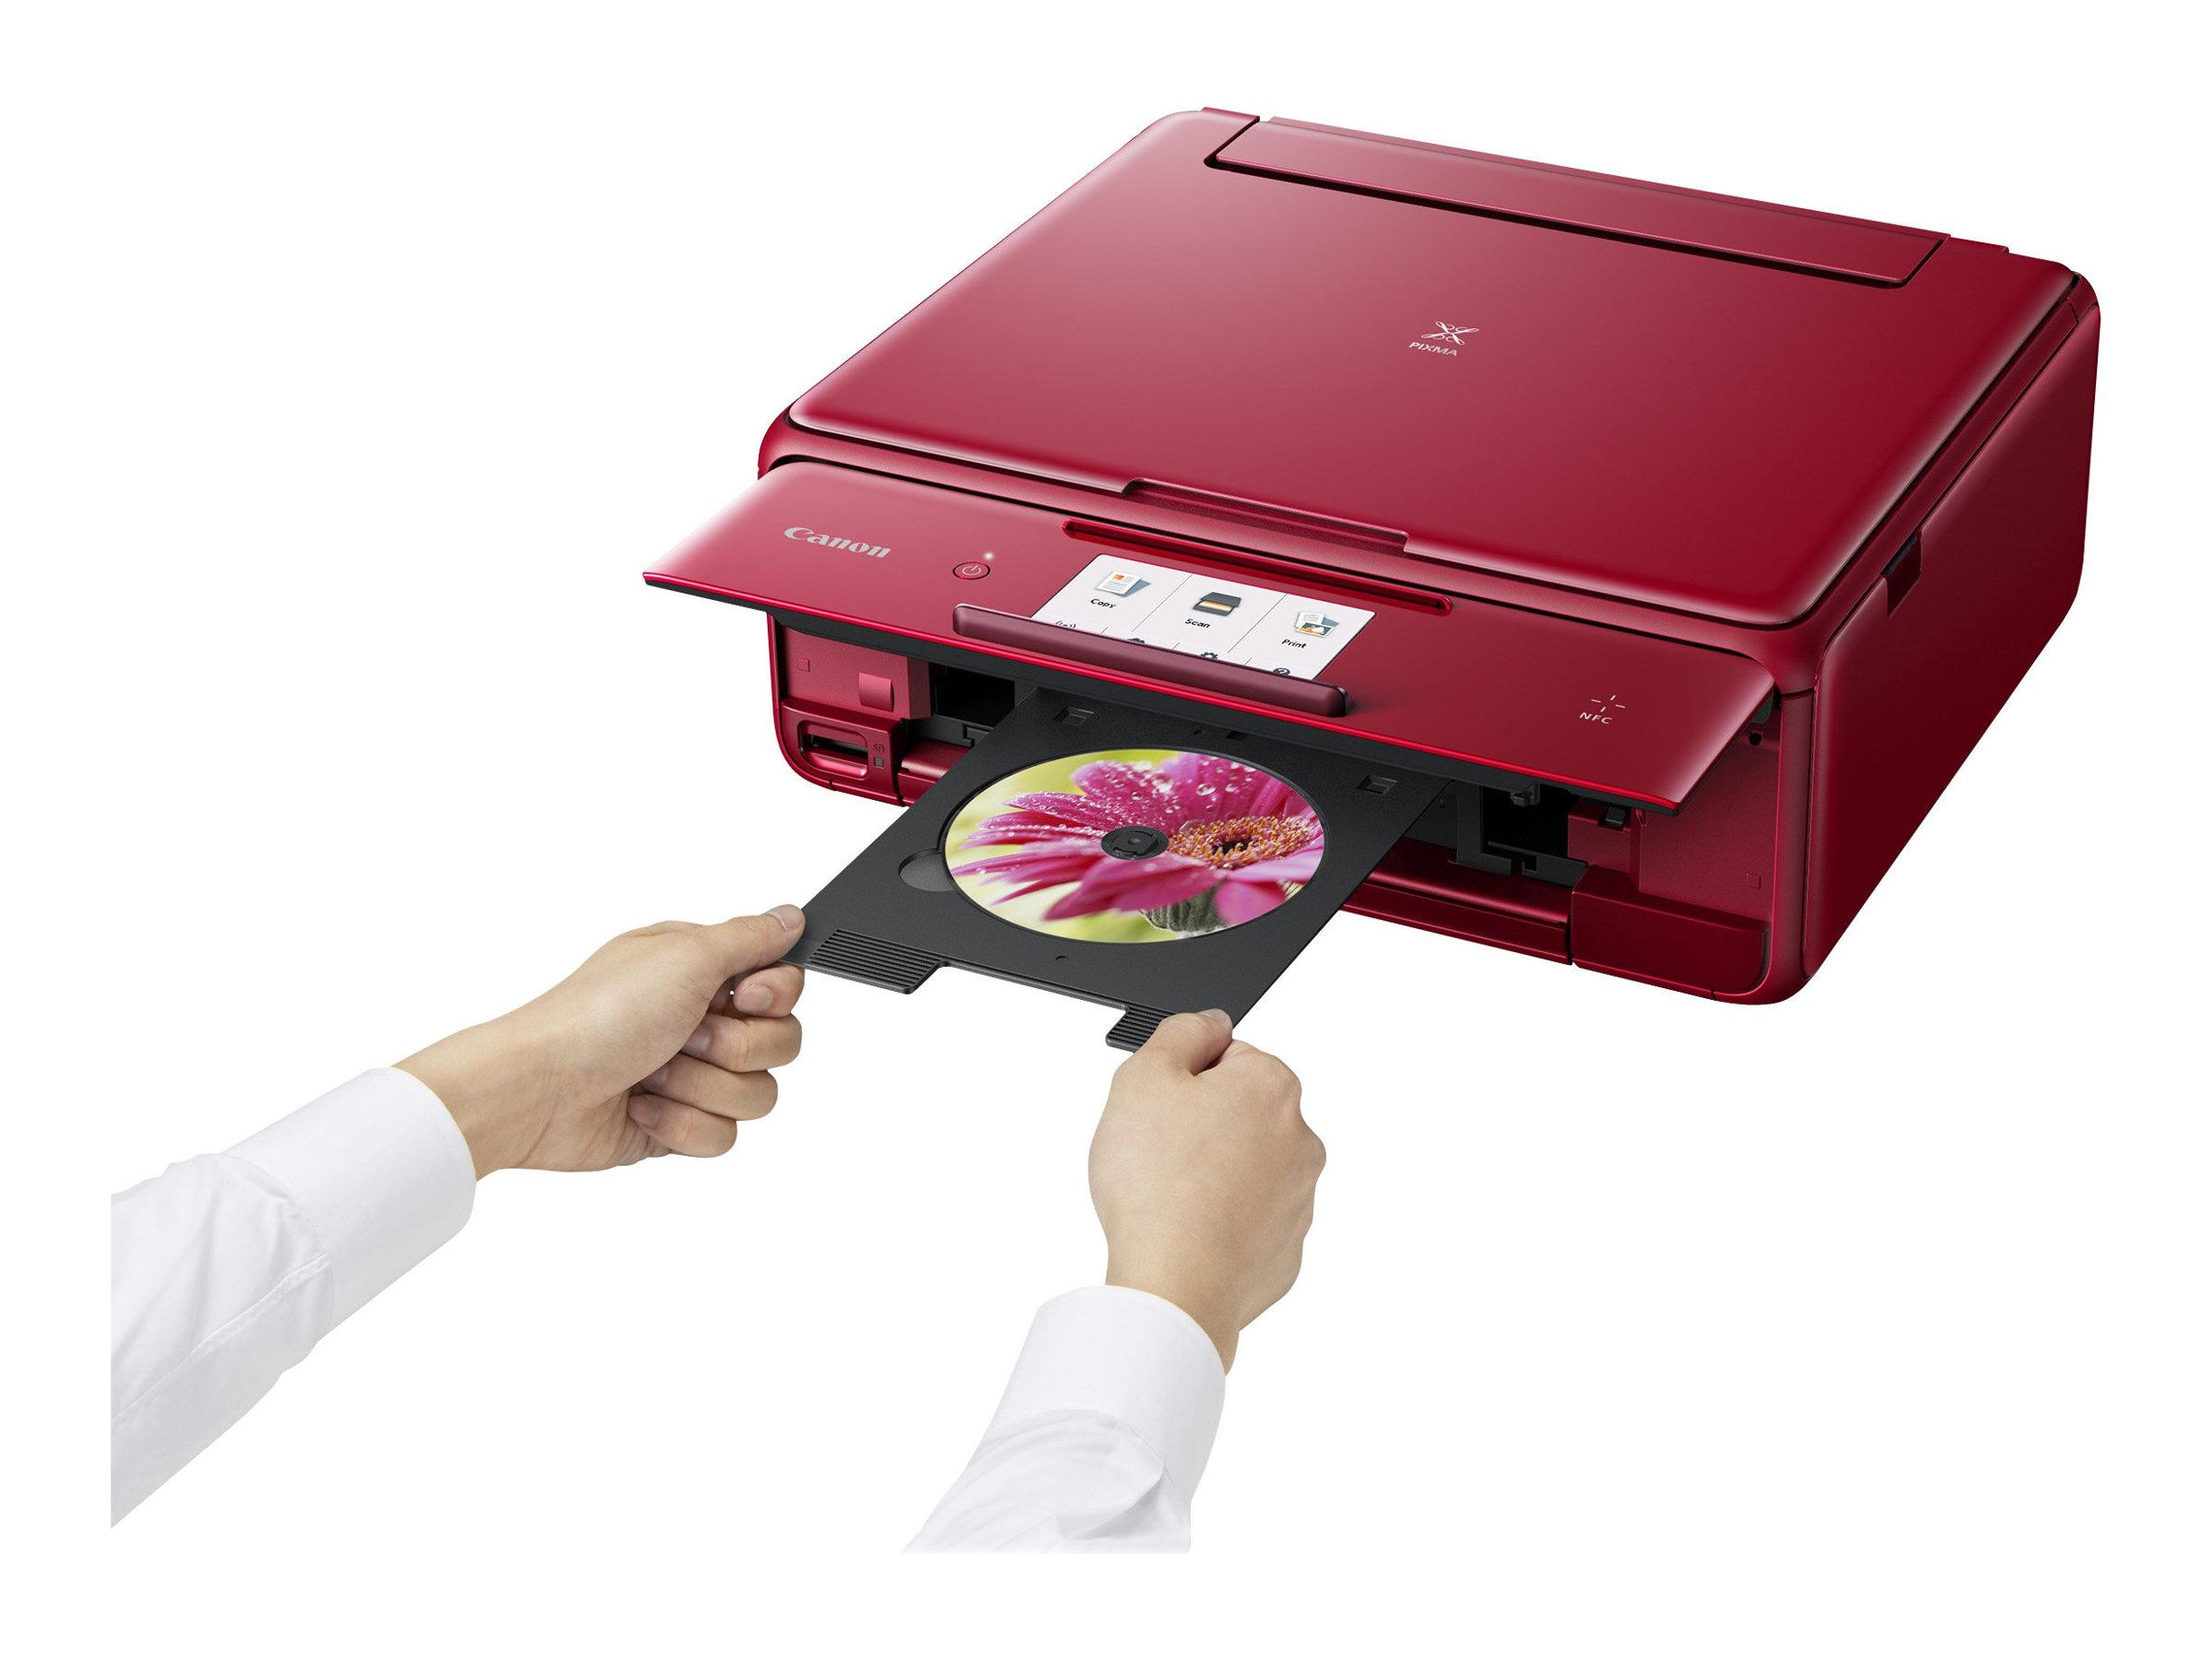 Canon PIXMA TS8052 - Multifunktionsdrucker - Farbe - Tintenstrahl - 216 x 297 mm (Original) - A4/Legal (Medien)